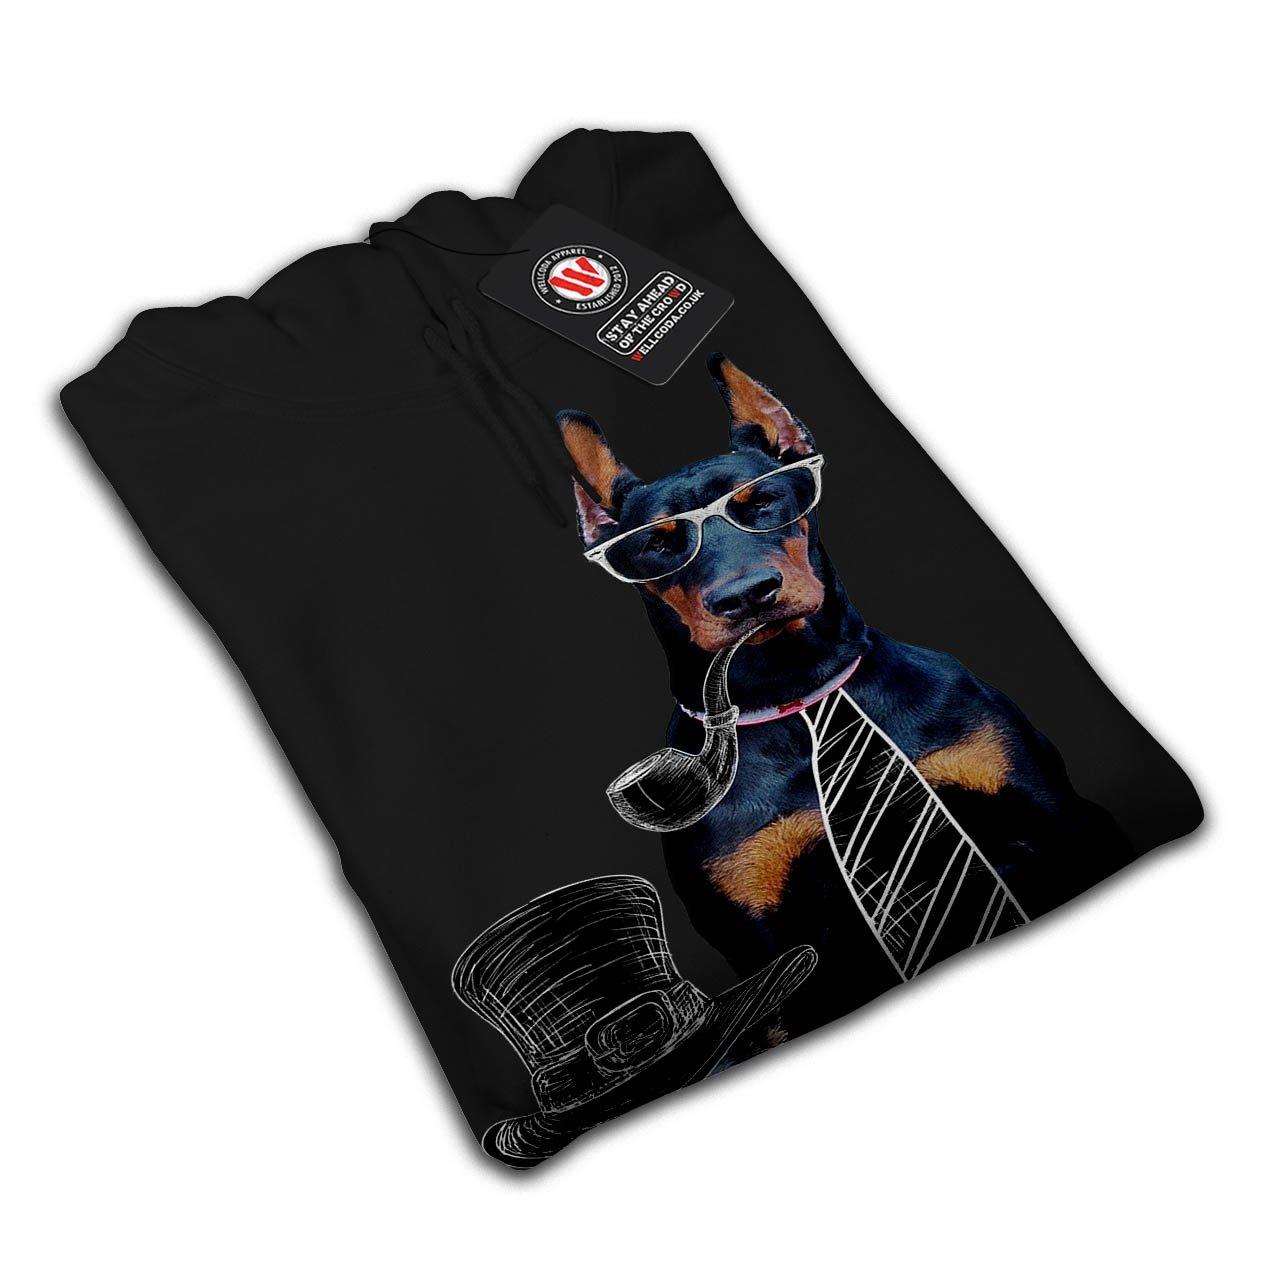 Puppy Print Hooded Sweatshirt Wellcoda Sir Cute Funny Dog Womens Hoodie